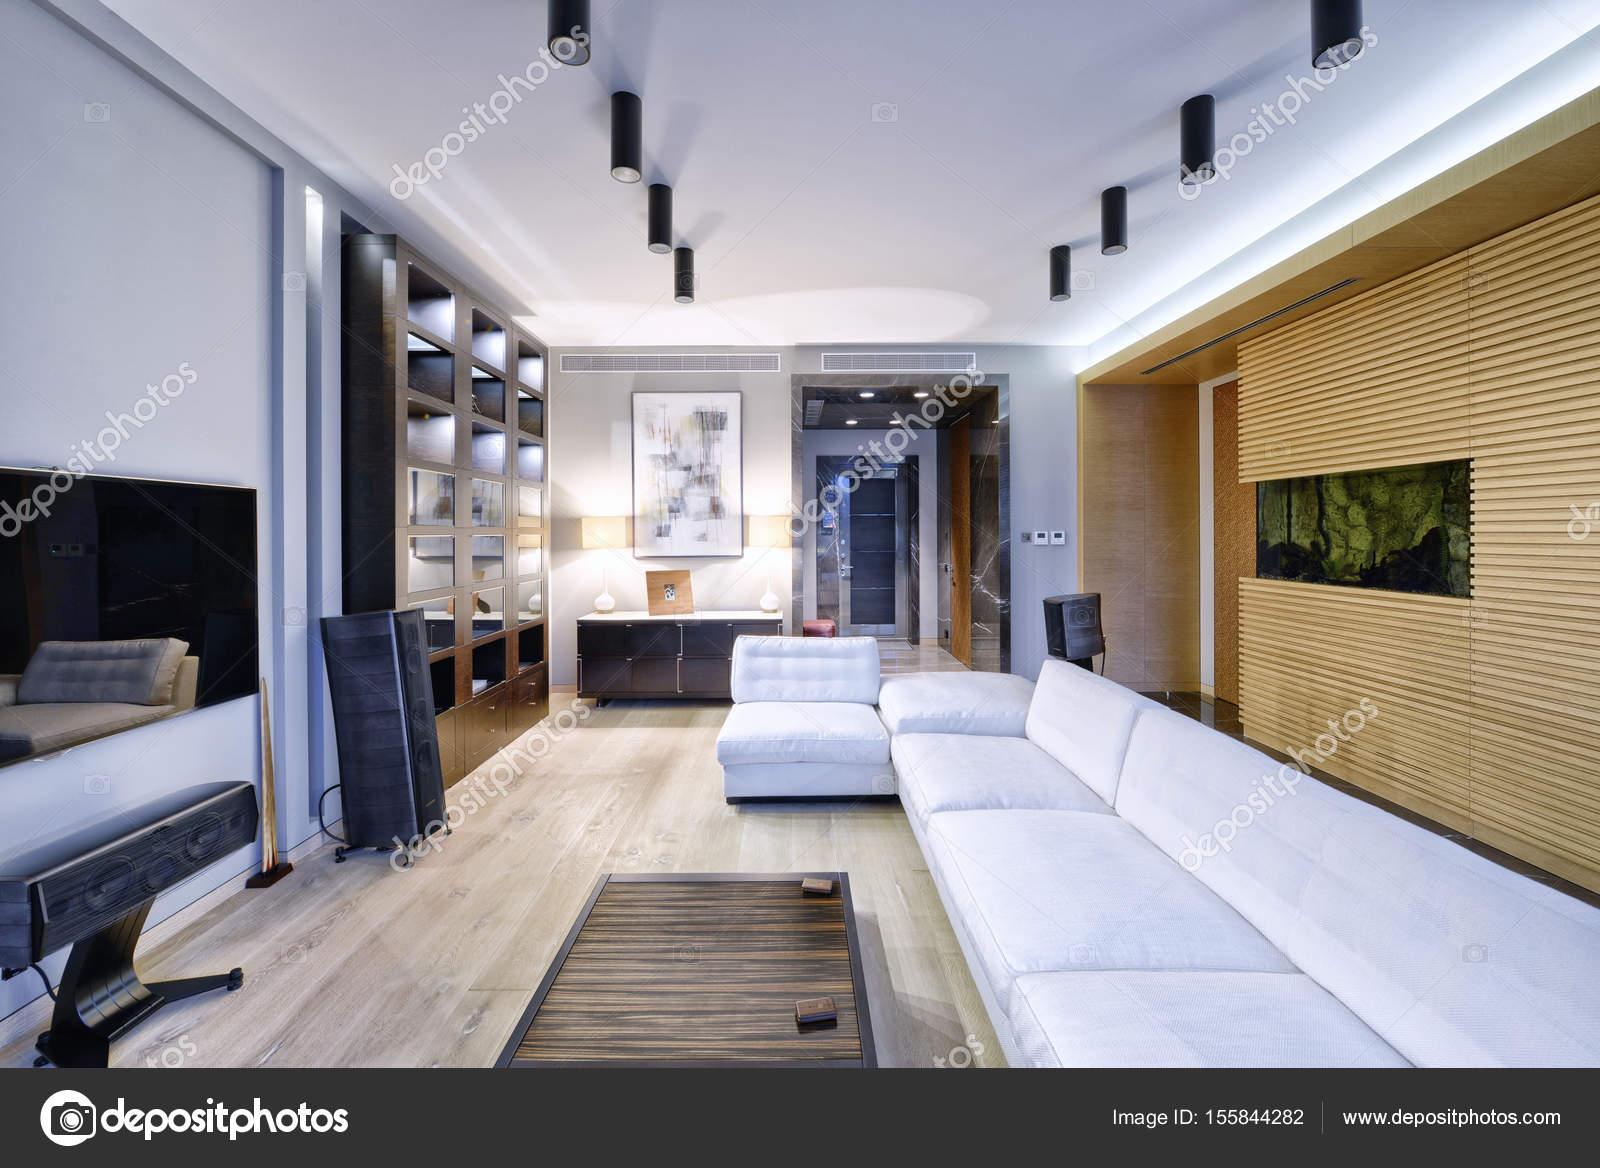 woonkamer interieur in moderne huis — Stockfoto © ovchinnikovfoto ...